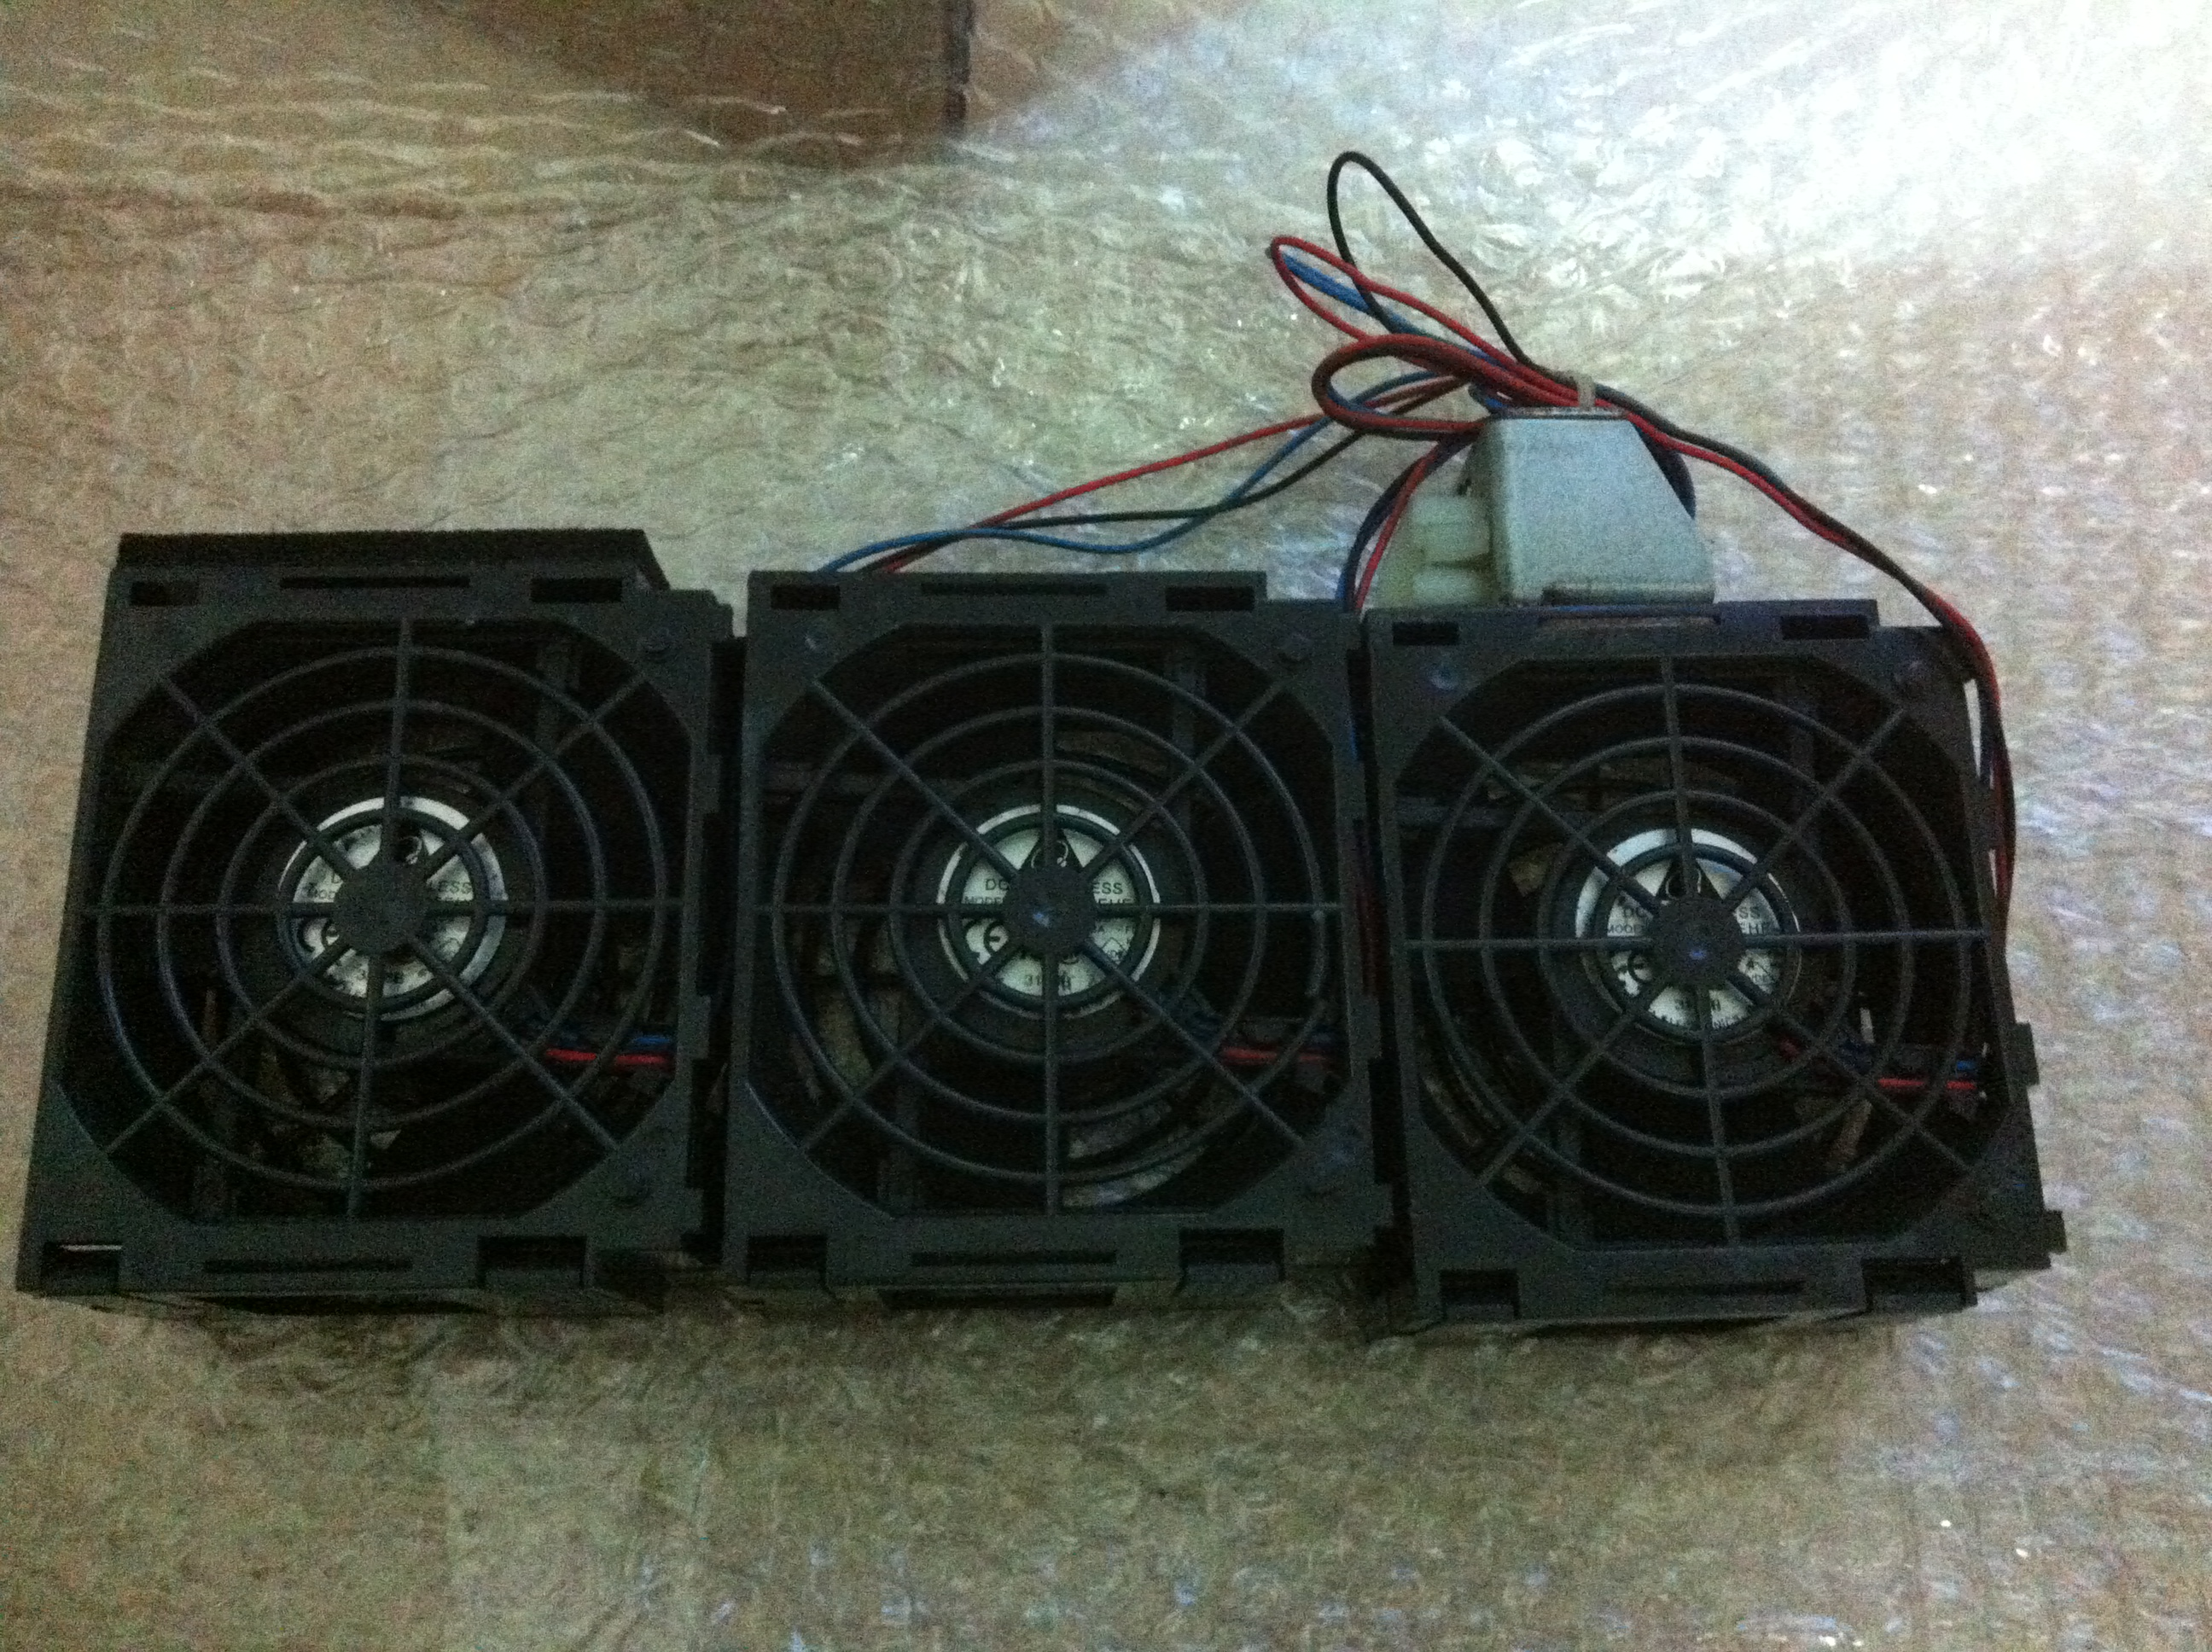 Вентилятор охлаждения Delta  DATEL 8032 EFB0812EHF DC12V 0.68A вентилятор охлаждения efb0824ehf 8032 24v 0 35a ct